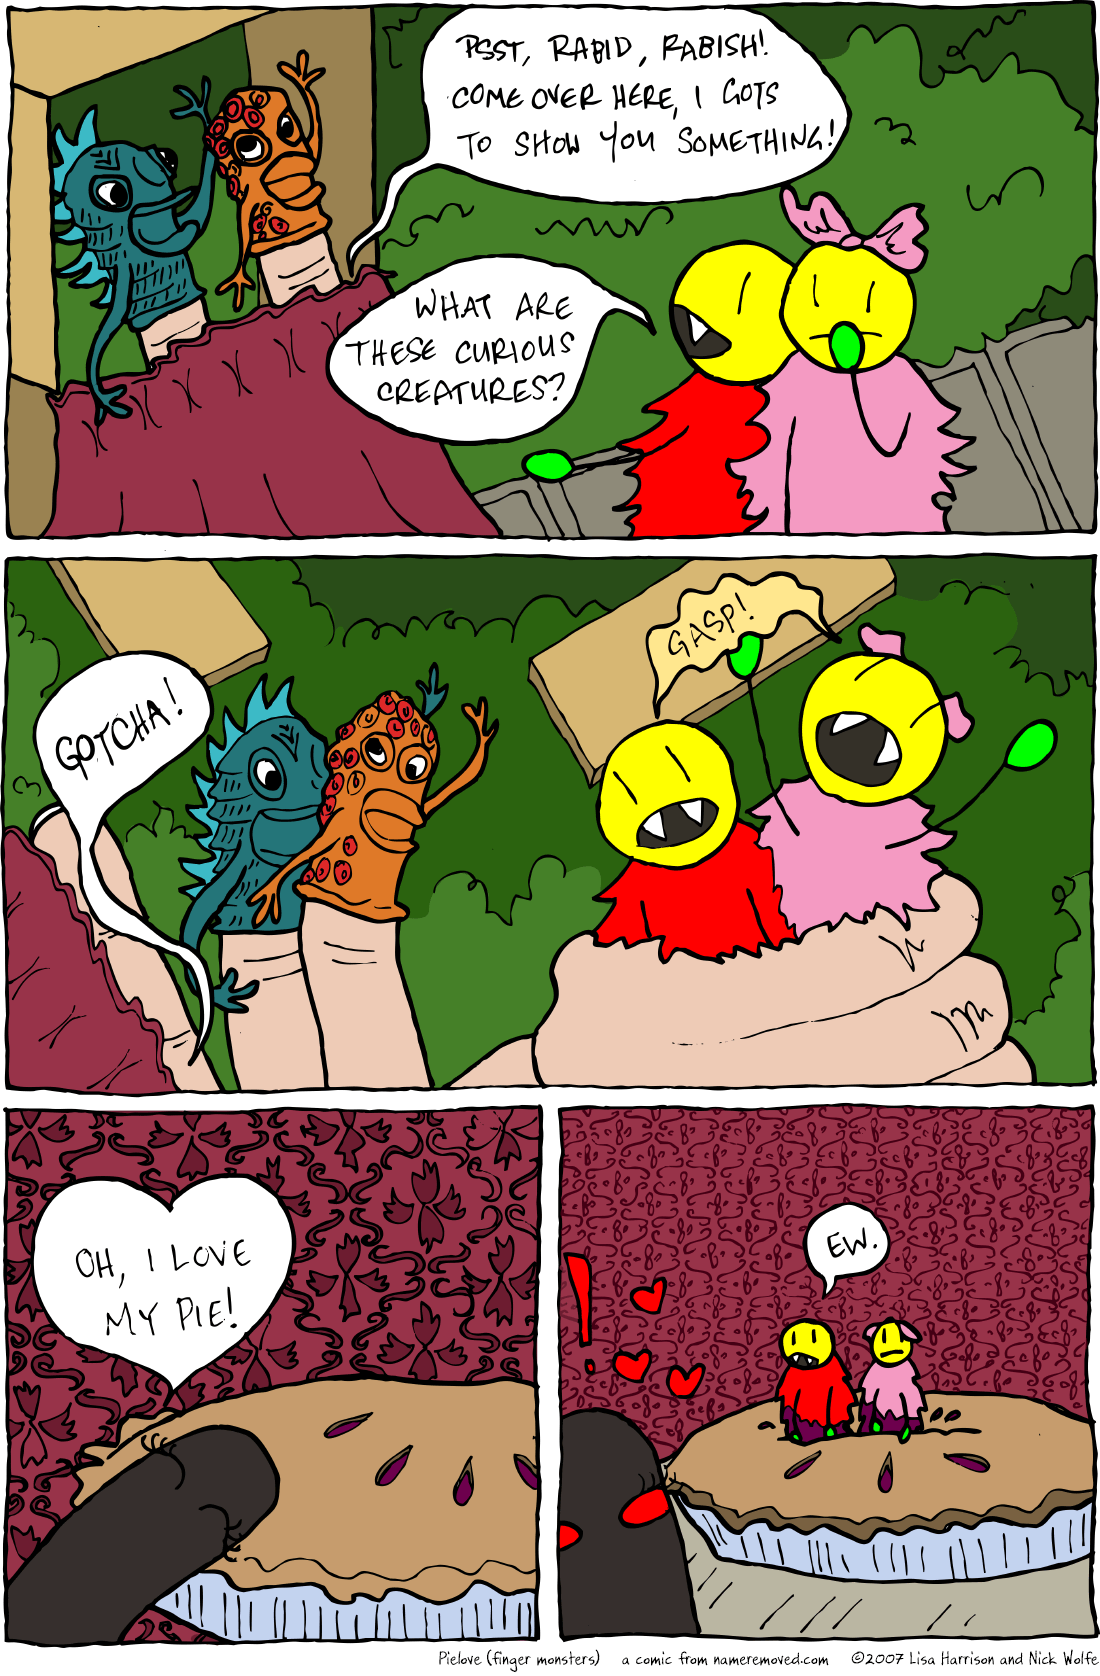 Pielove (finger monsters)